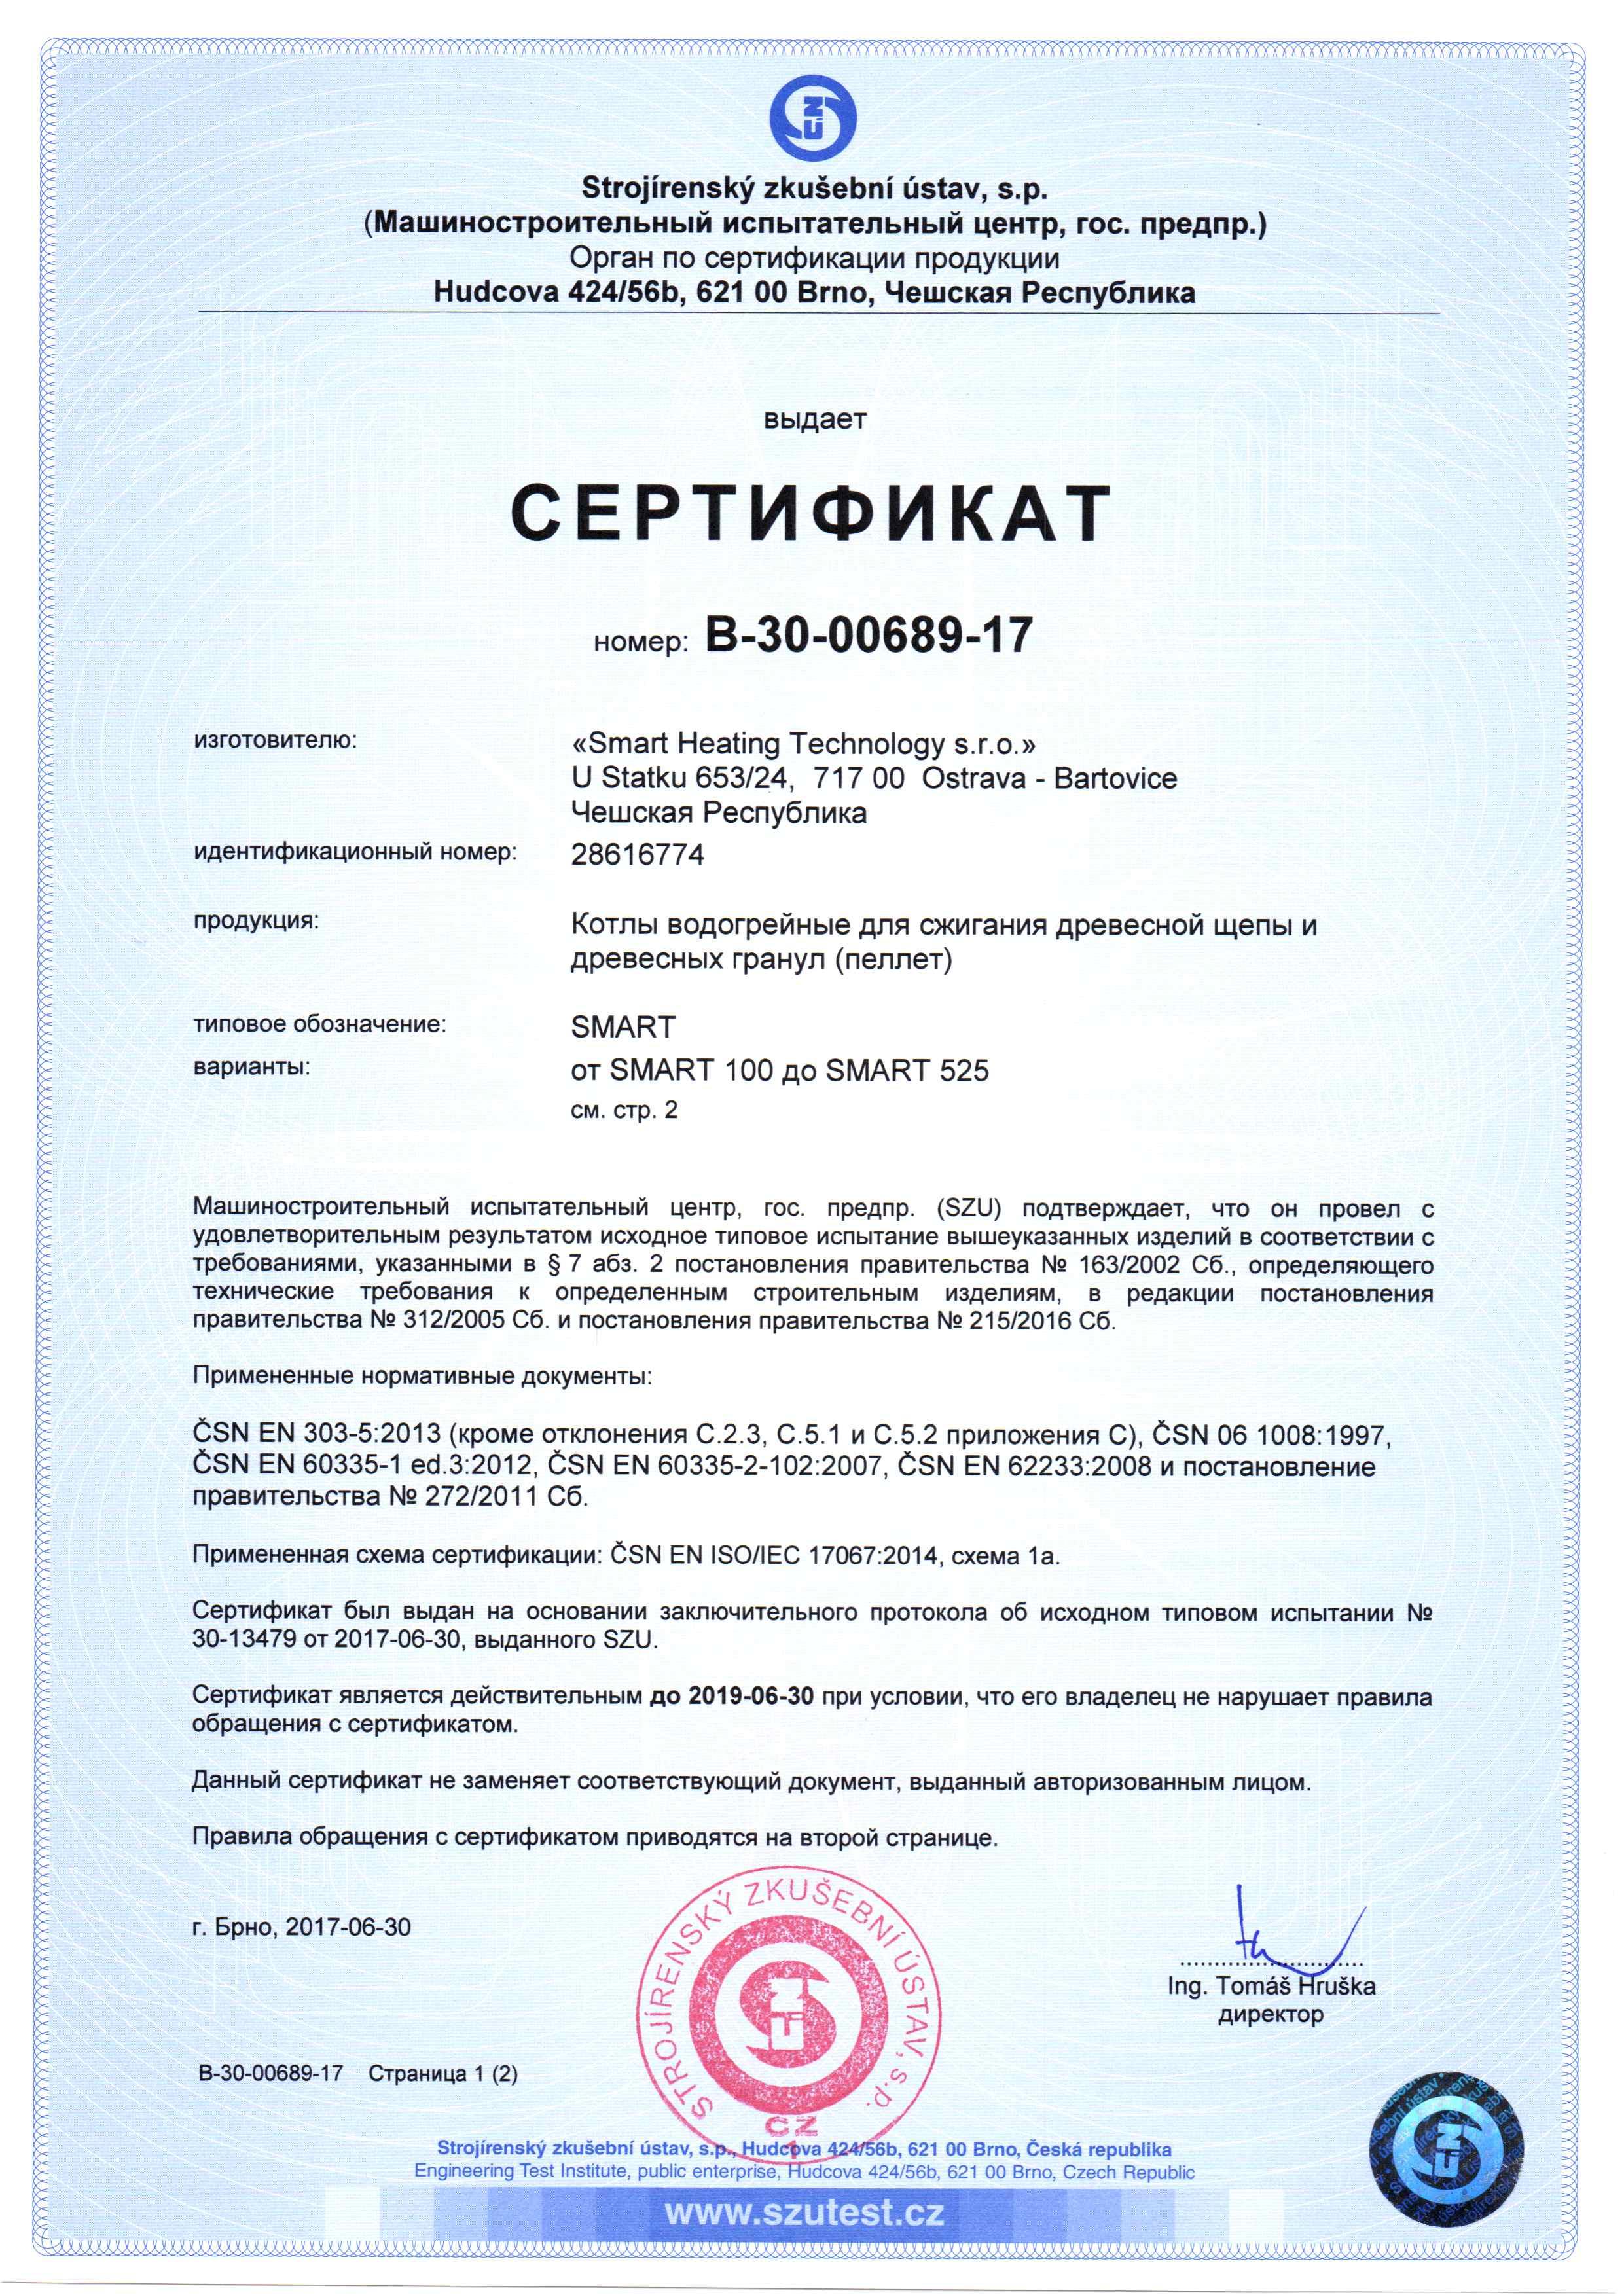 CERTIFIKAT B-30-00689-17 RU